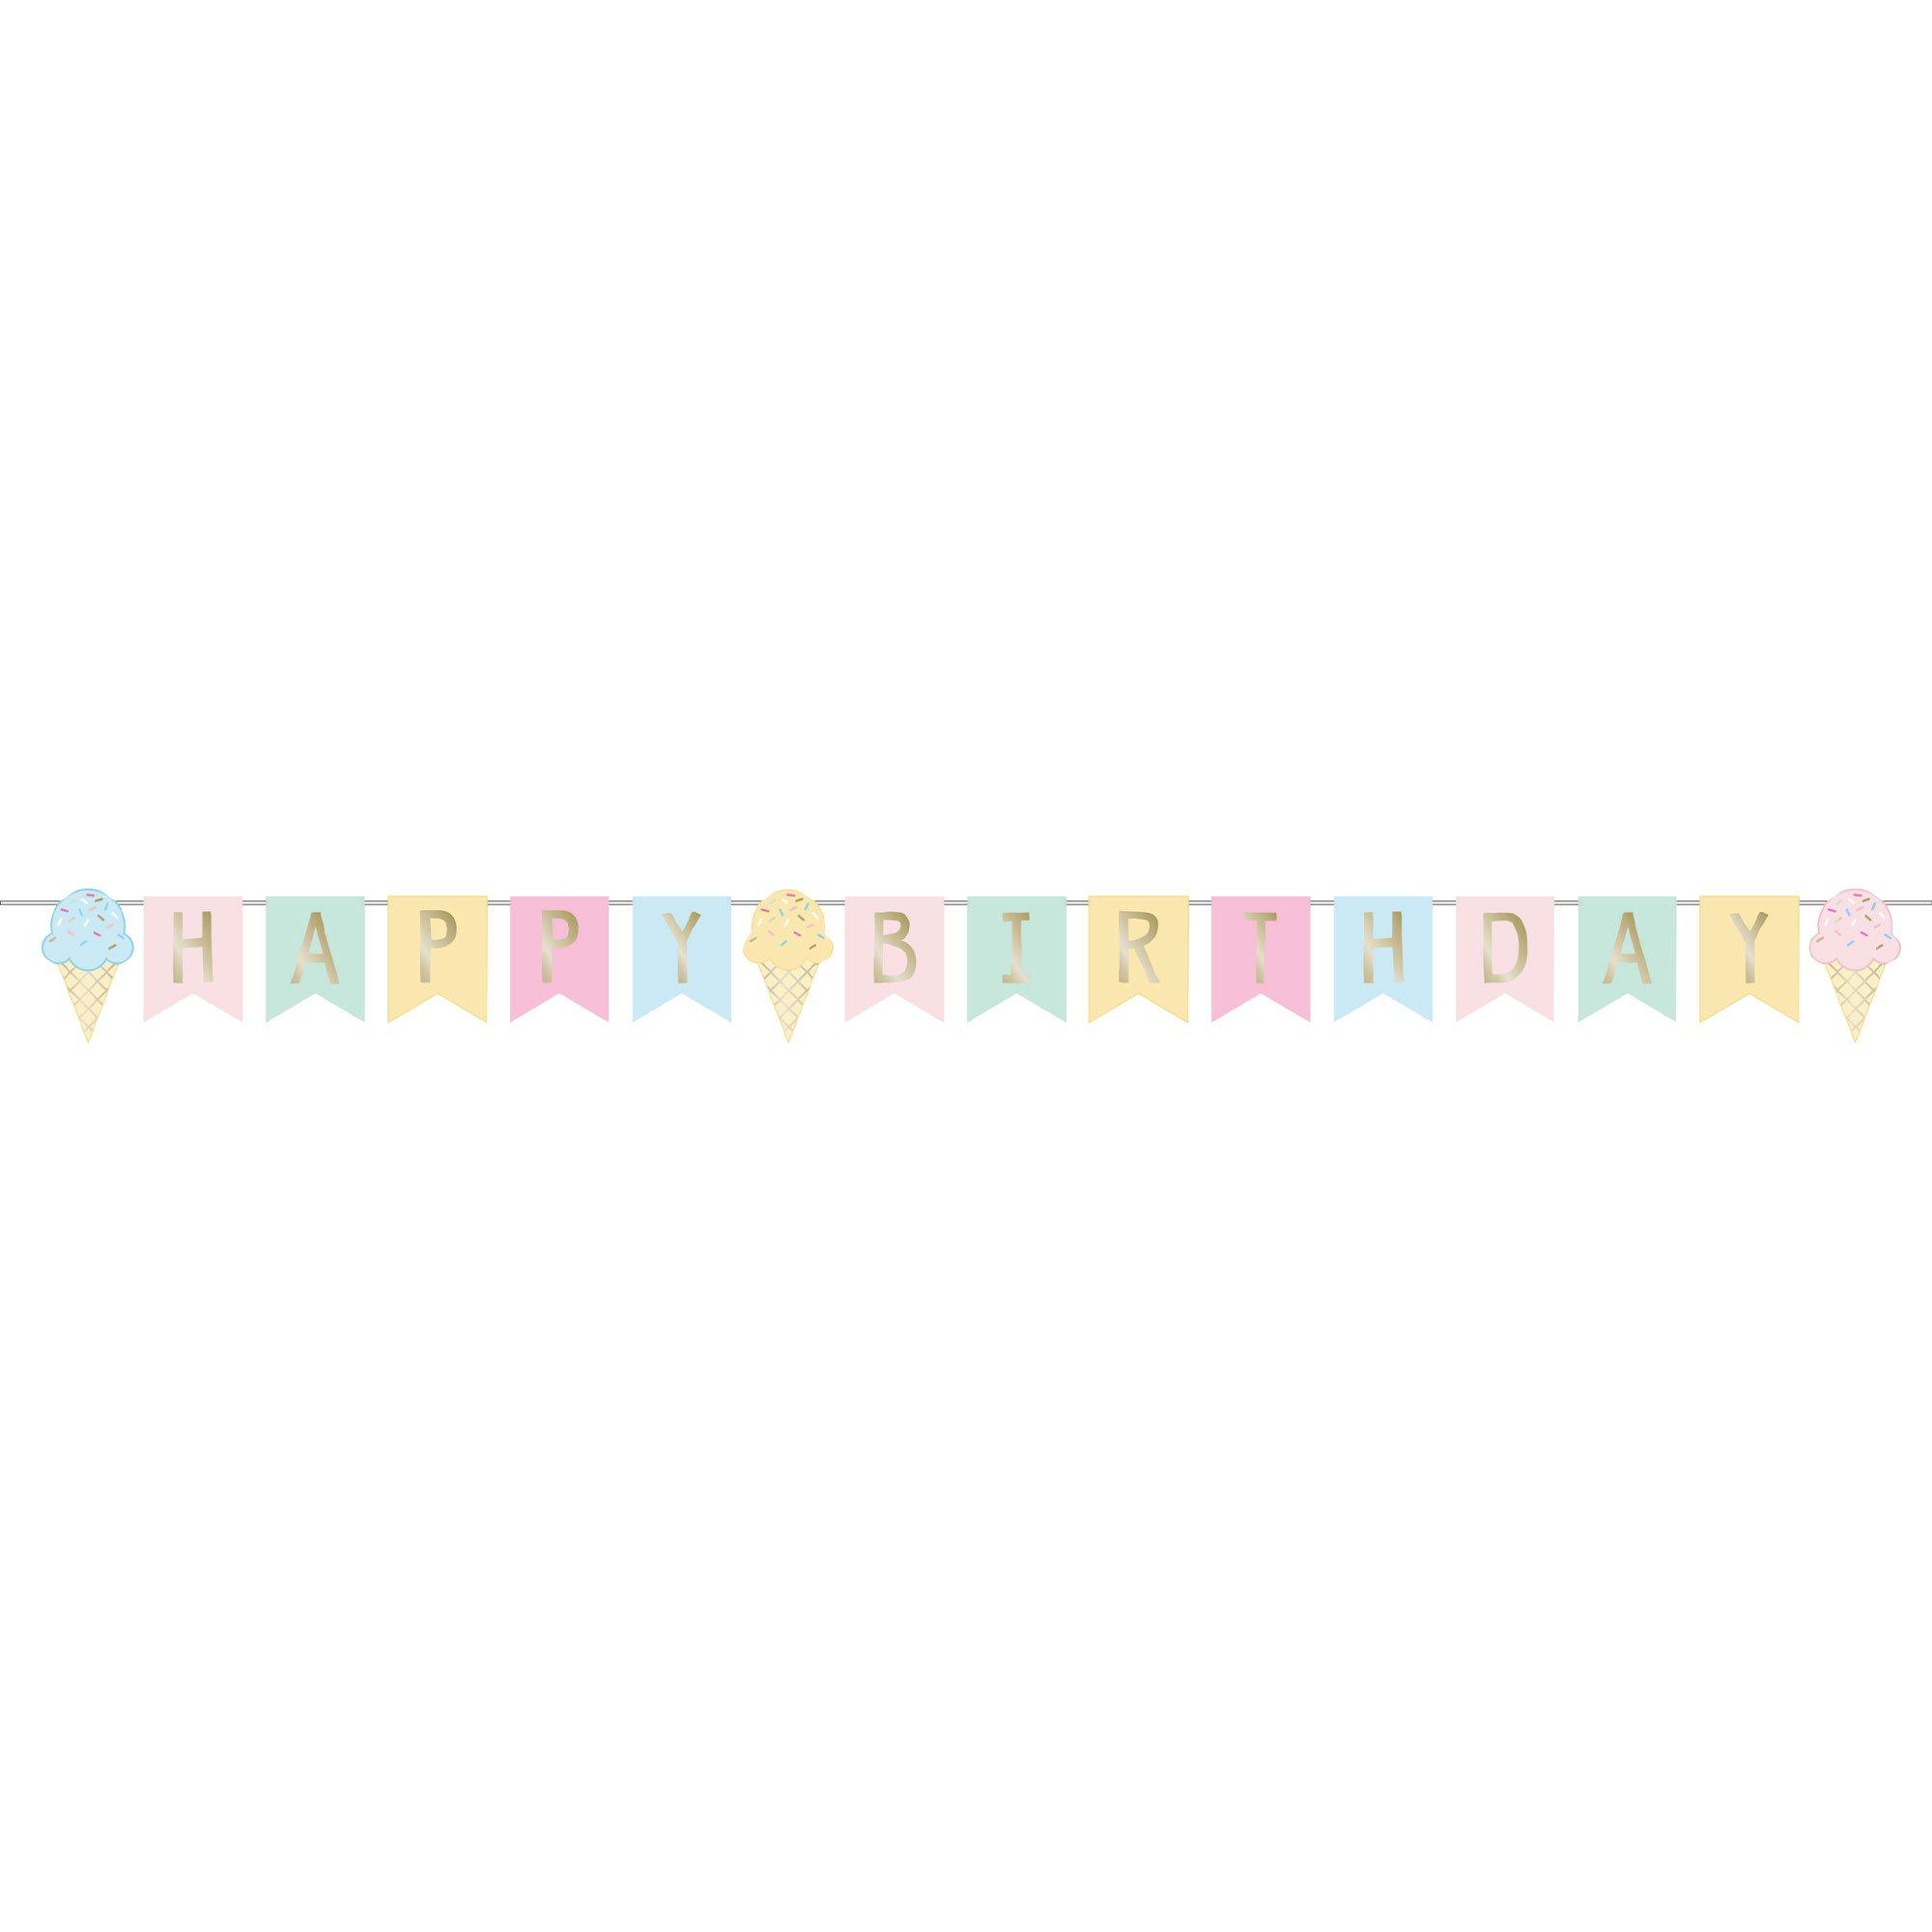 Ice Cream Party Decor Happy Birthday Ribbon Banner & Foil 15cm x 2.52m